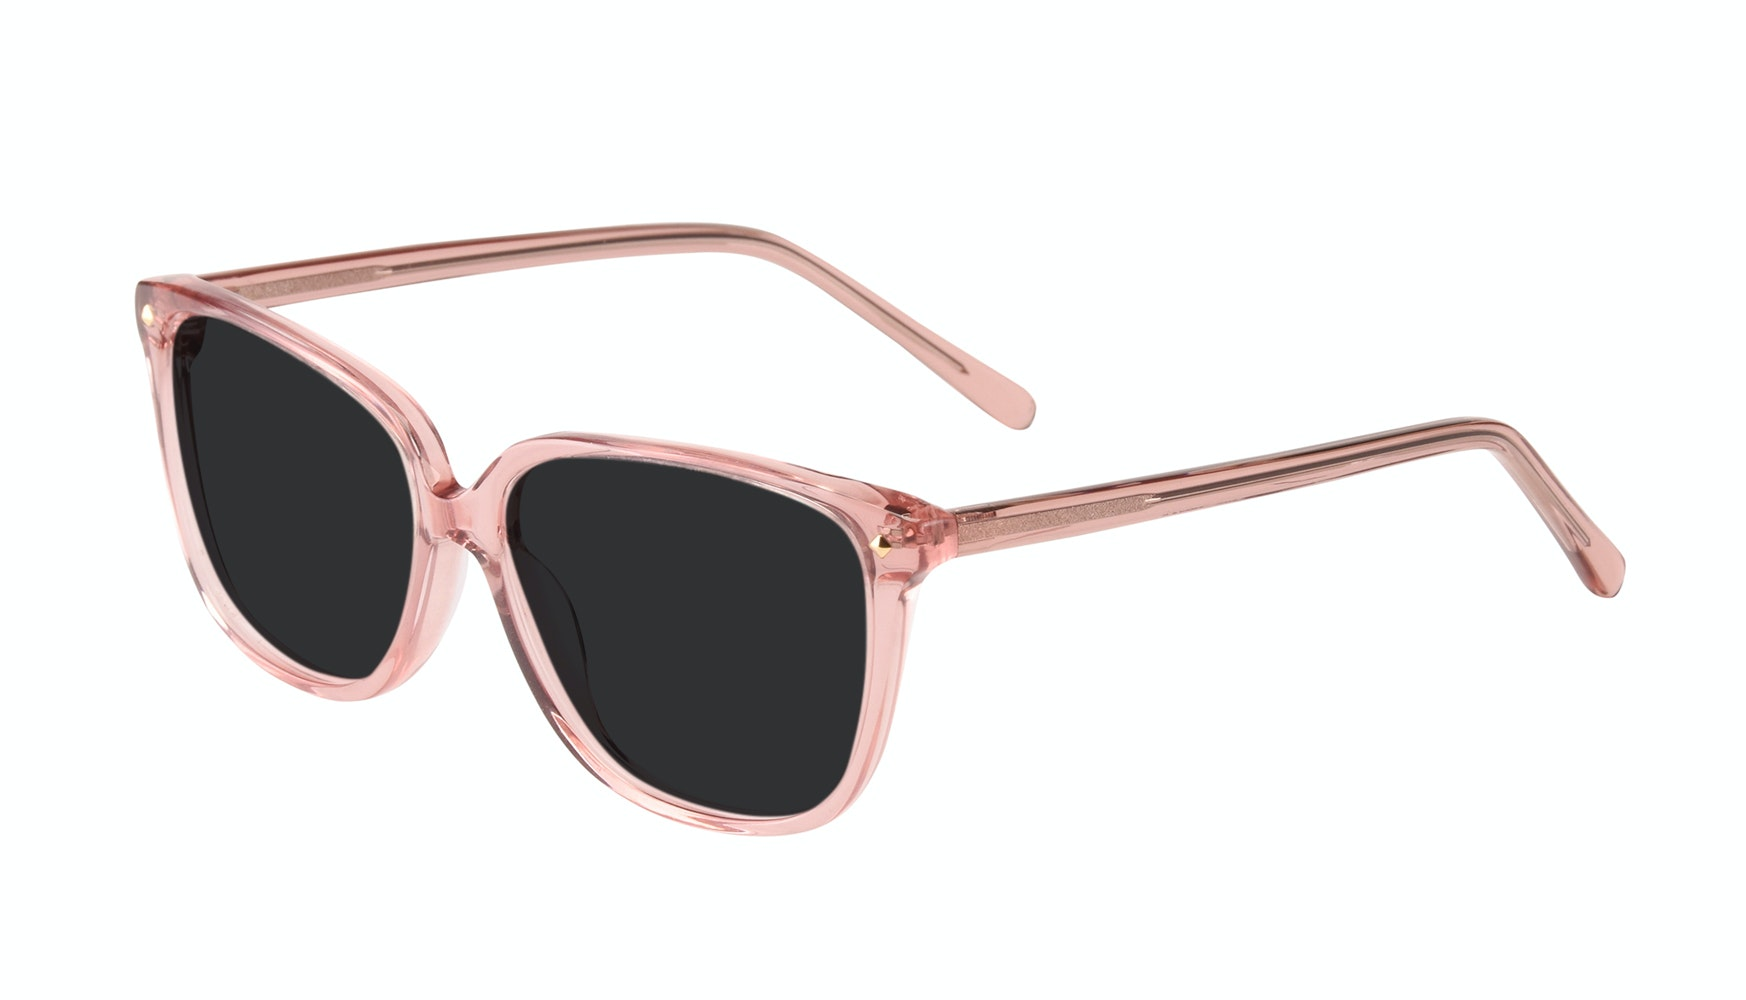 Affordable Fashion Glasses Rectangle Square Sunglasses Women Muse Rose Tilt